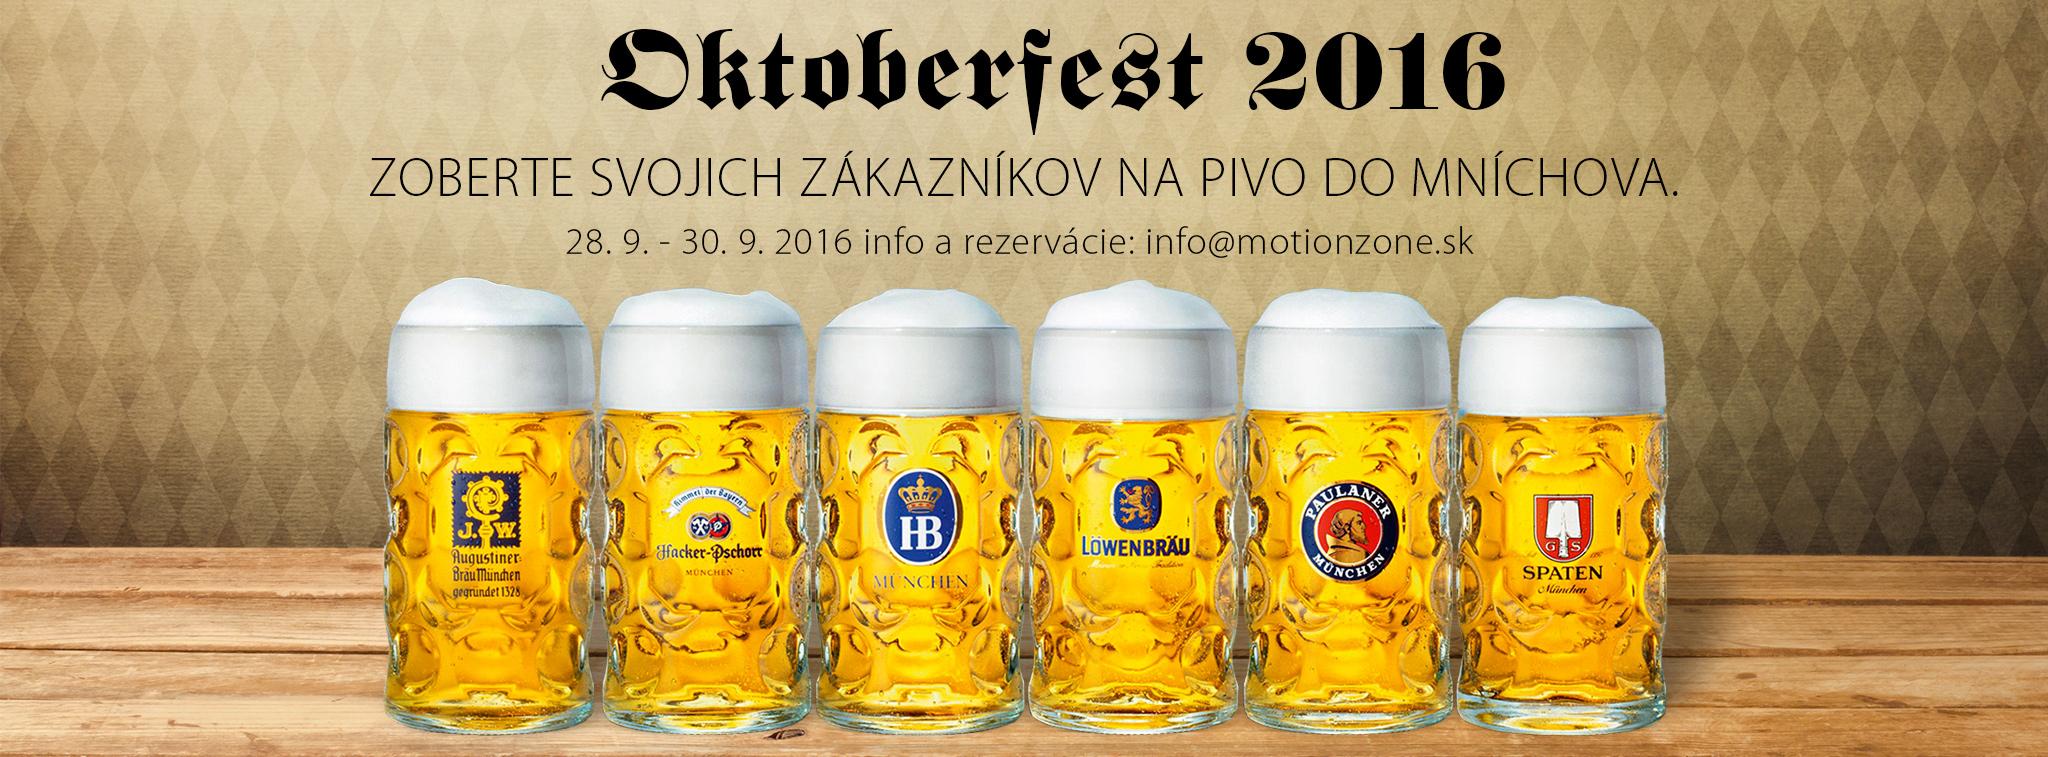 Octoberfest_2048x757_V2_sk_2016